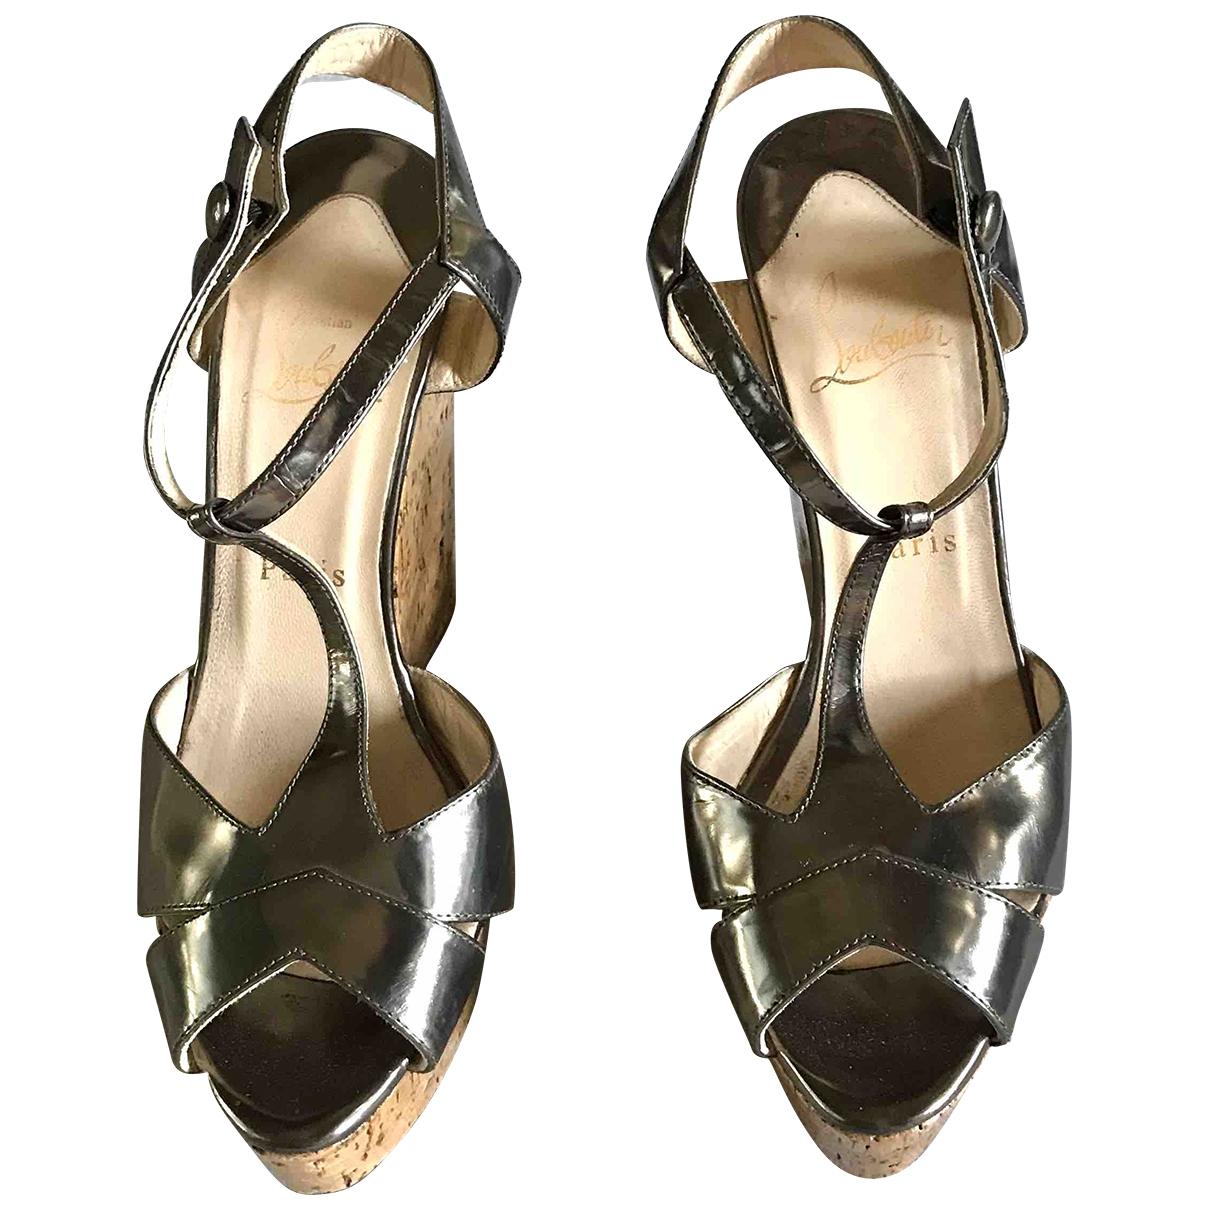 Christian Louboutin \N Silver Leather Sandals for Women 38 EU